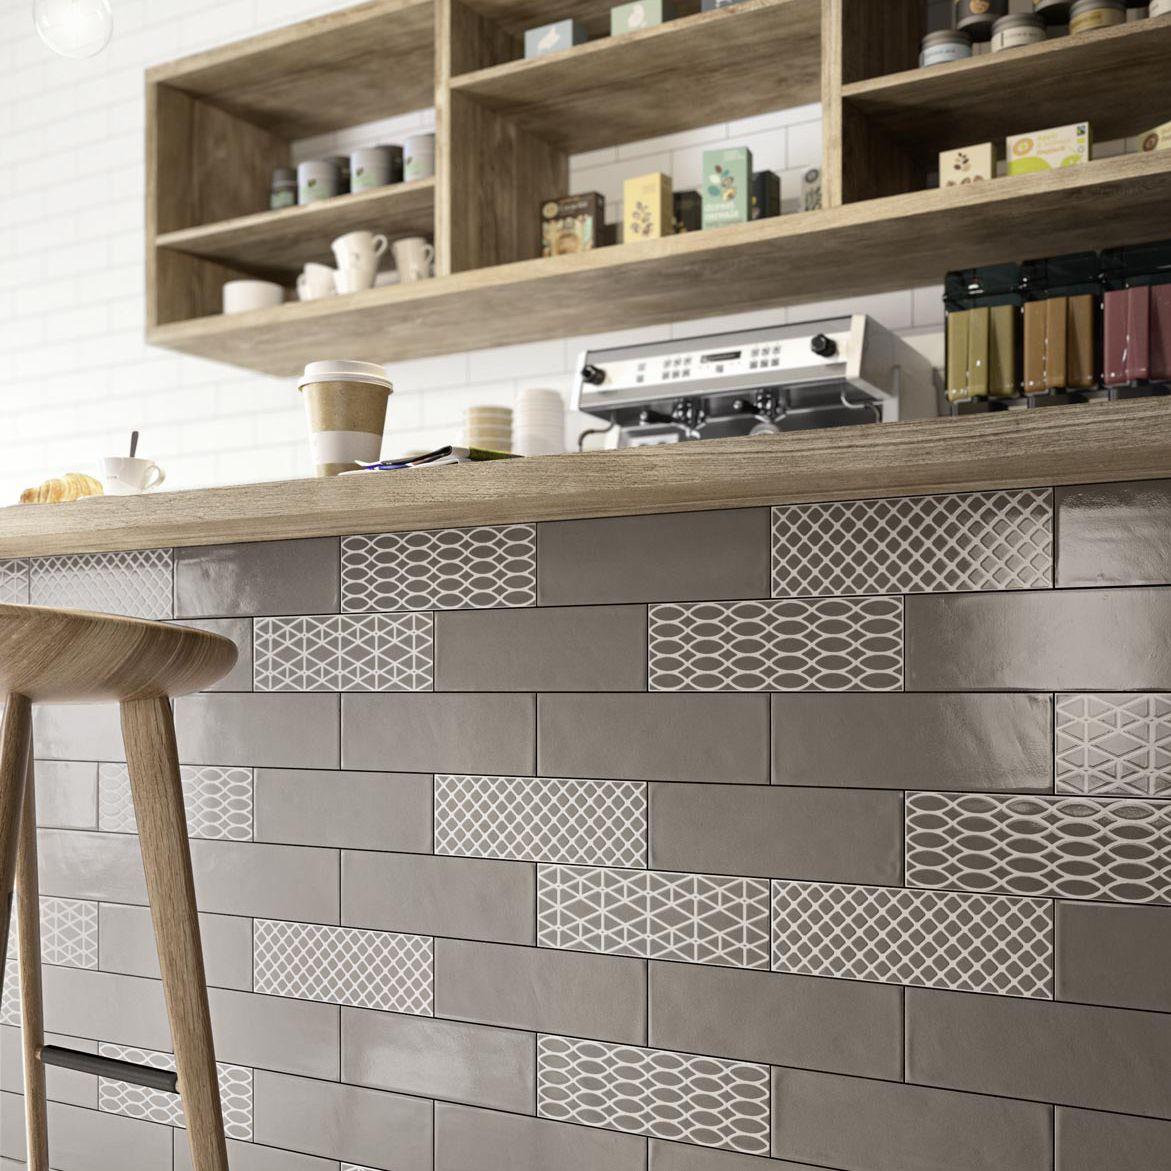 carrelage de salle de bain / de cuisine / mural / en céramique